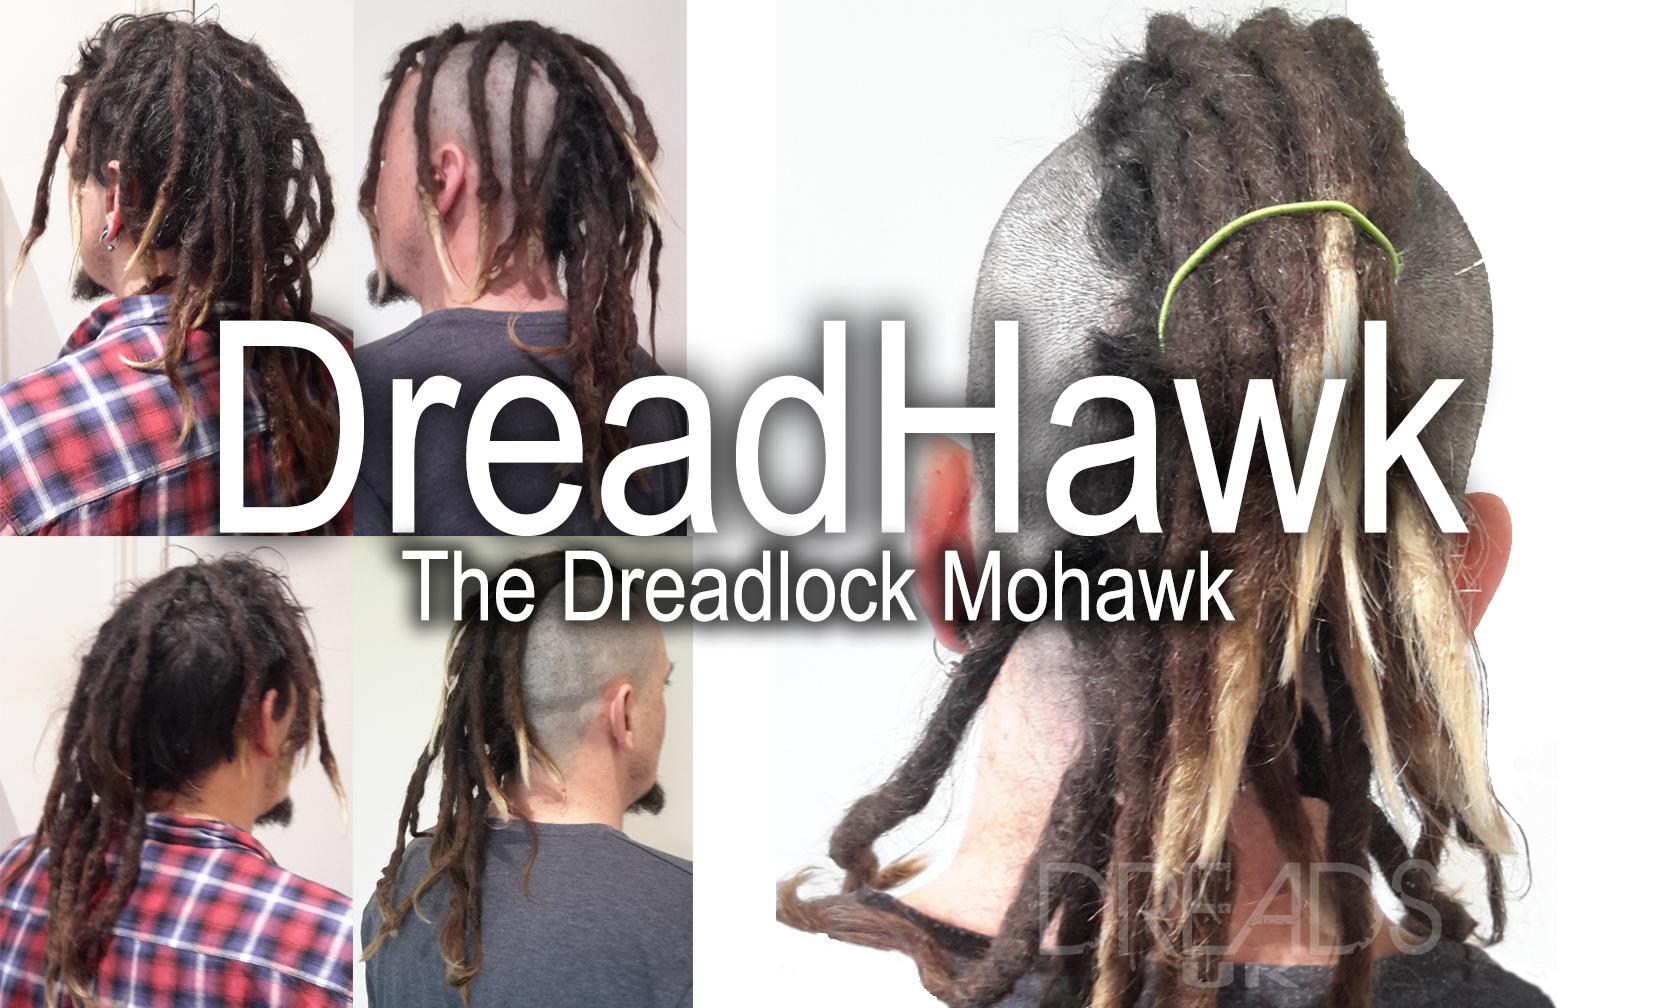 Dreadhawk